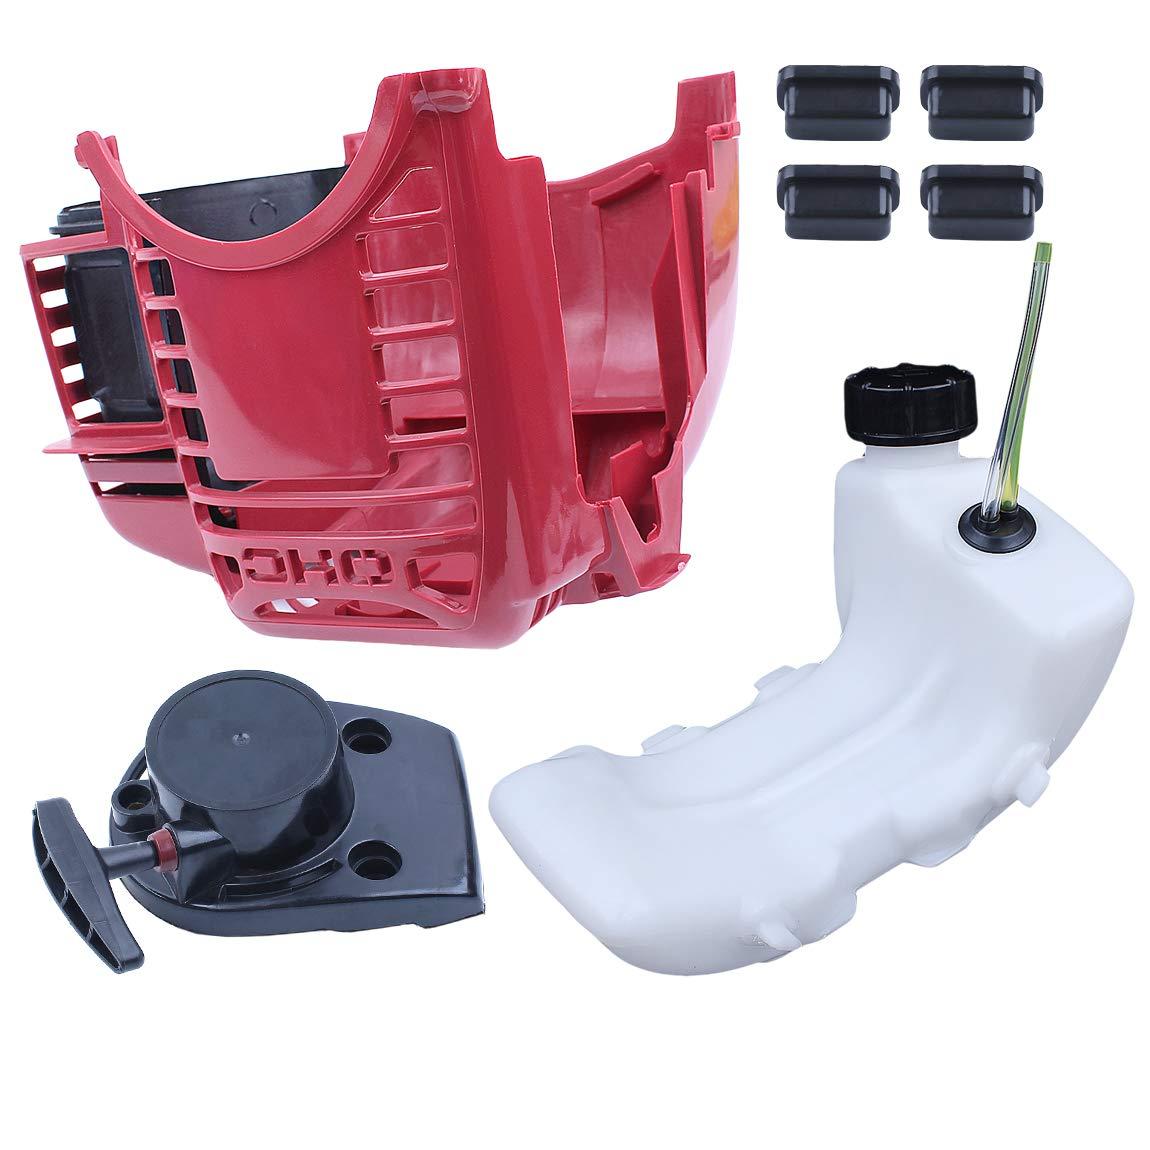 Cubierta Protectora del Motor Arrancador de Arranque Kit de ...